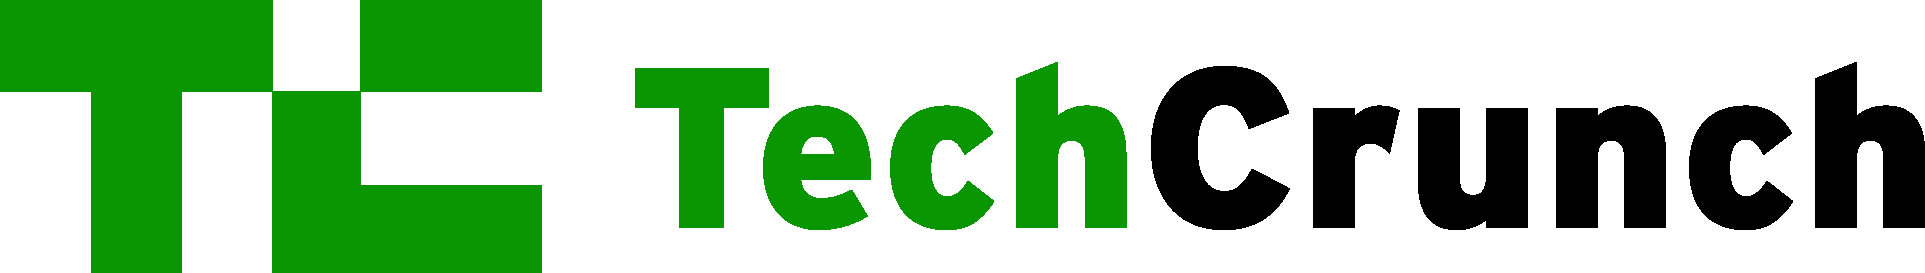 Techcrunch Logo Png